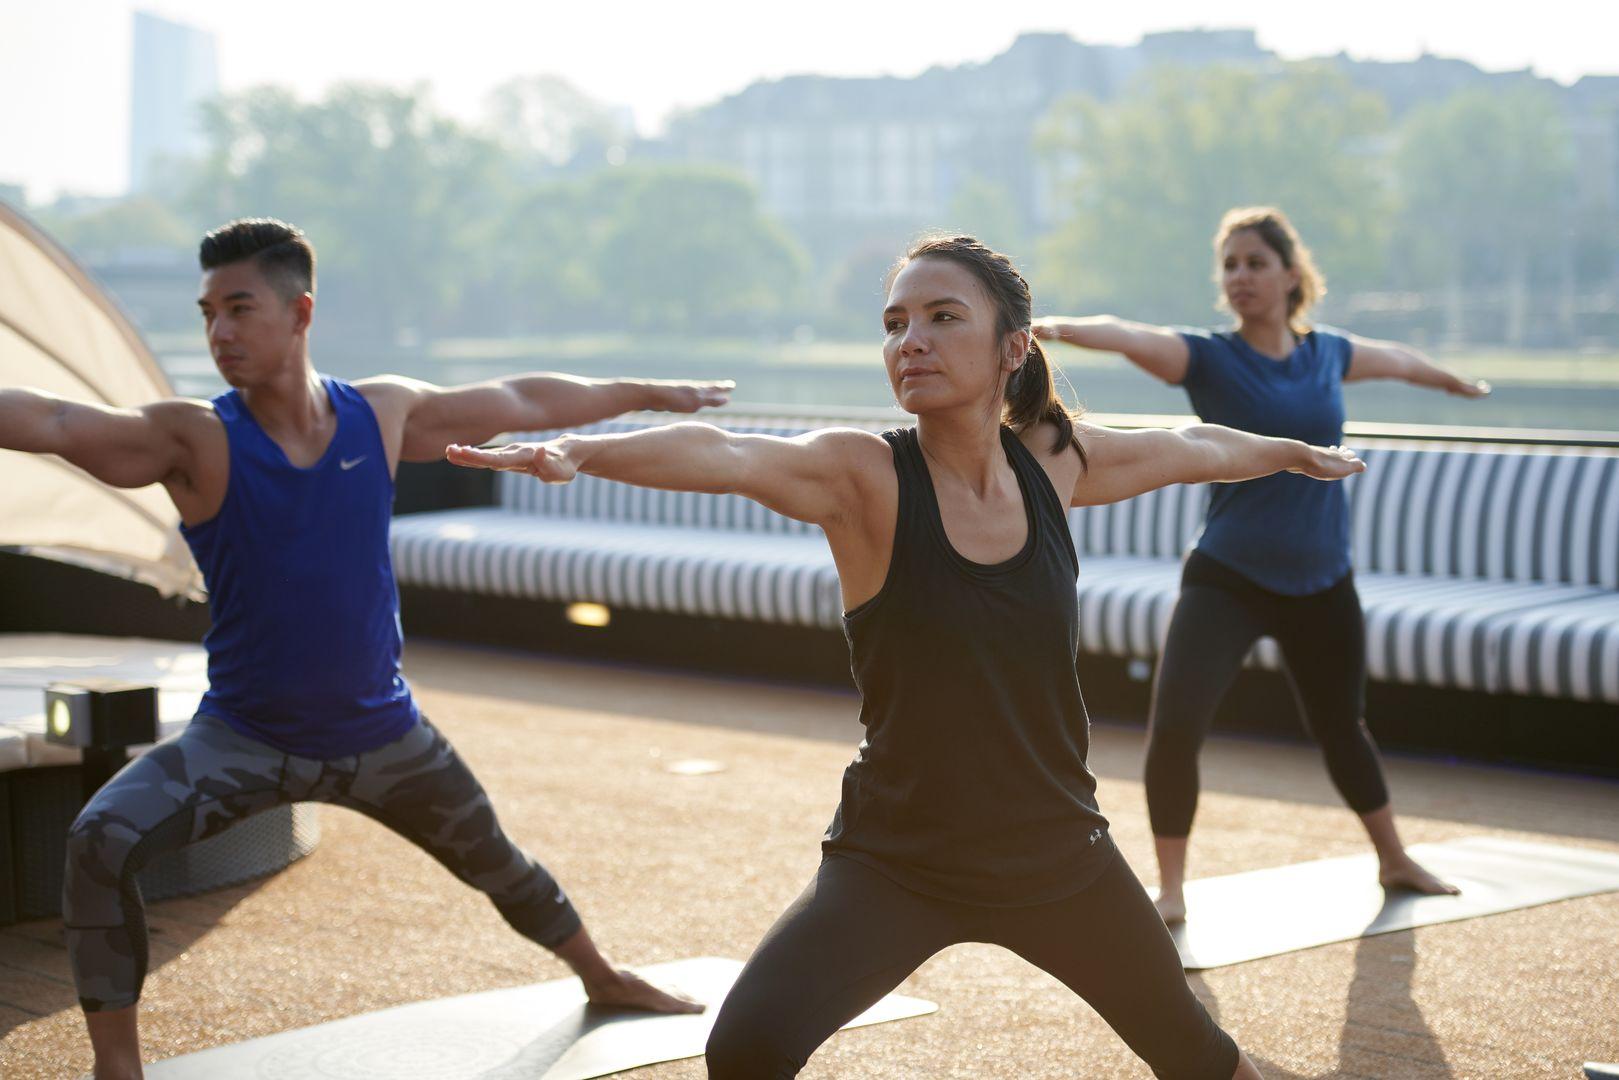 cruising alone - yoga class